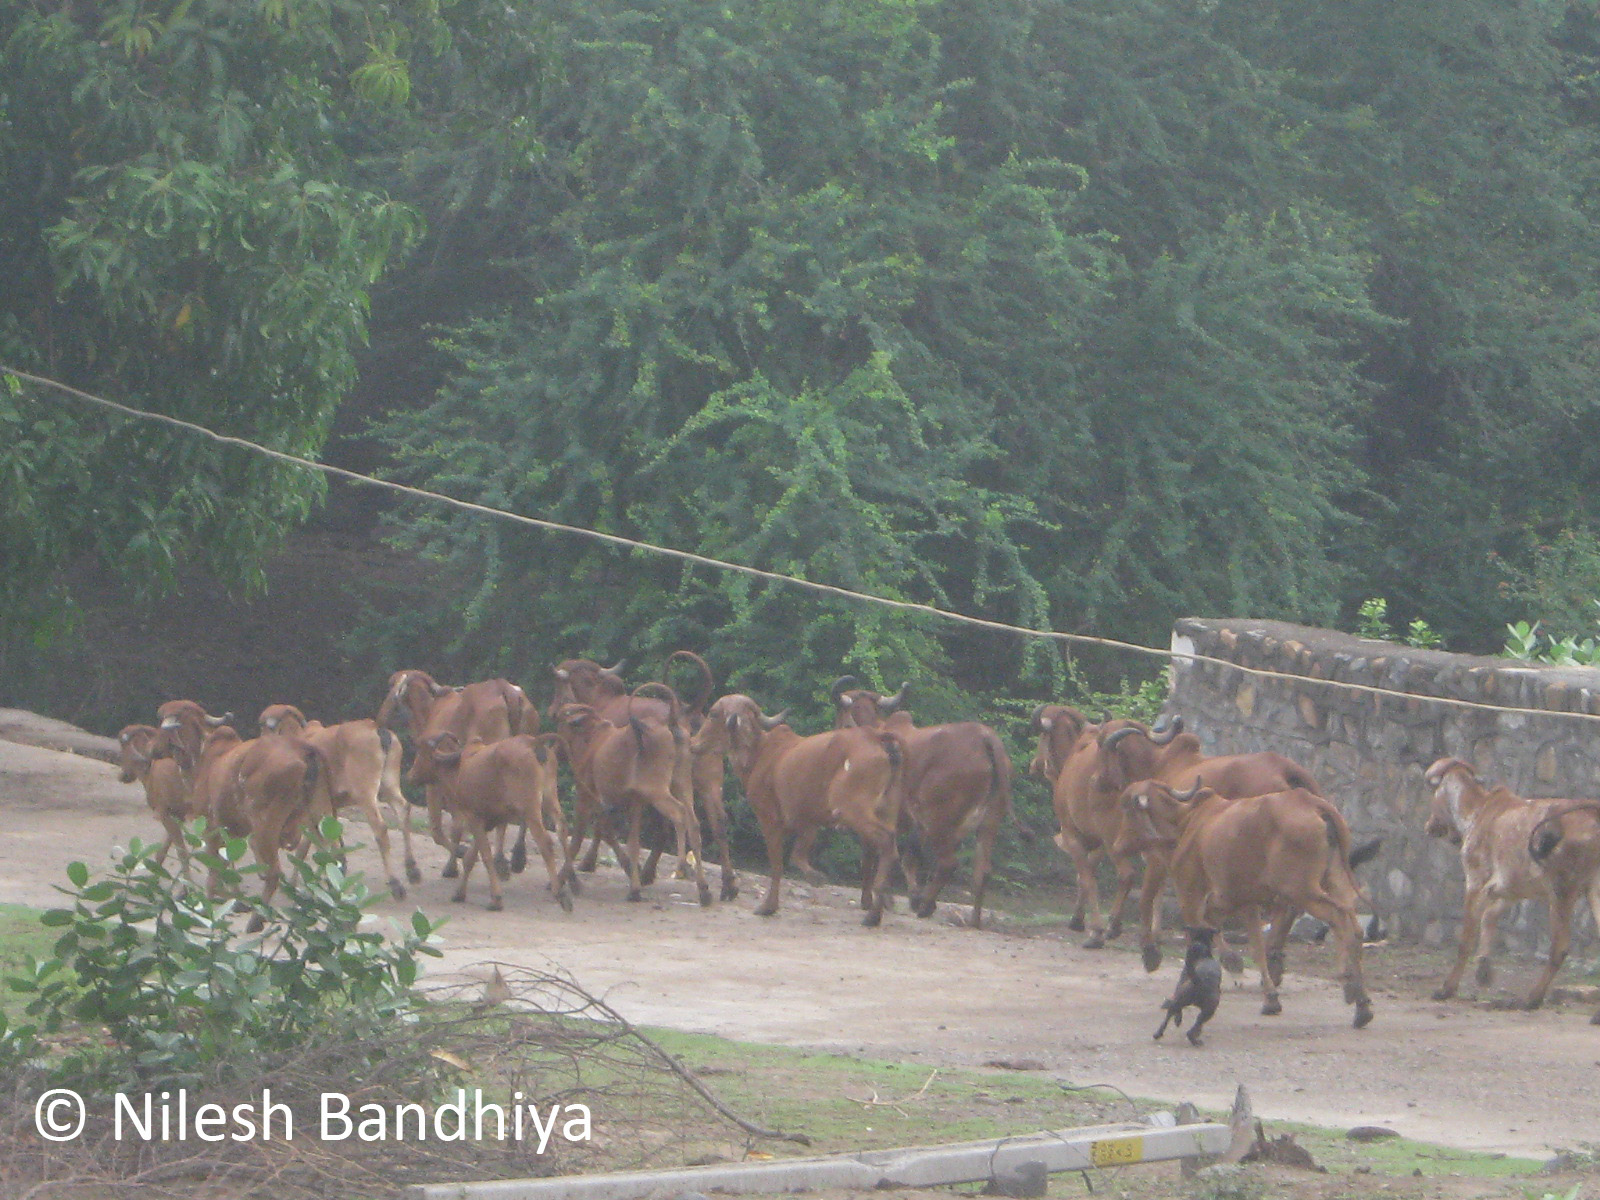 File:Running Cow at Girnar.jpg - Wikimedia Commons